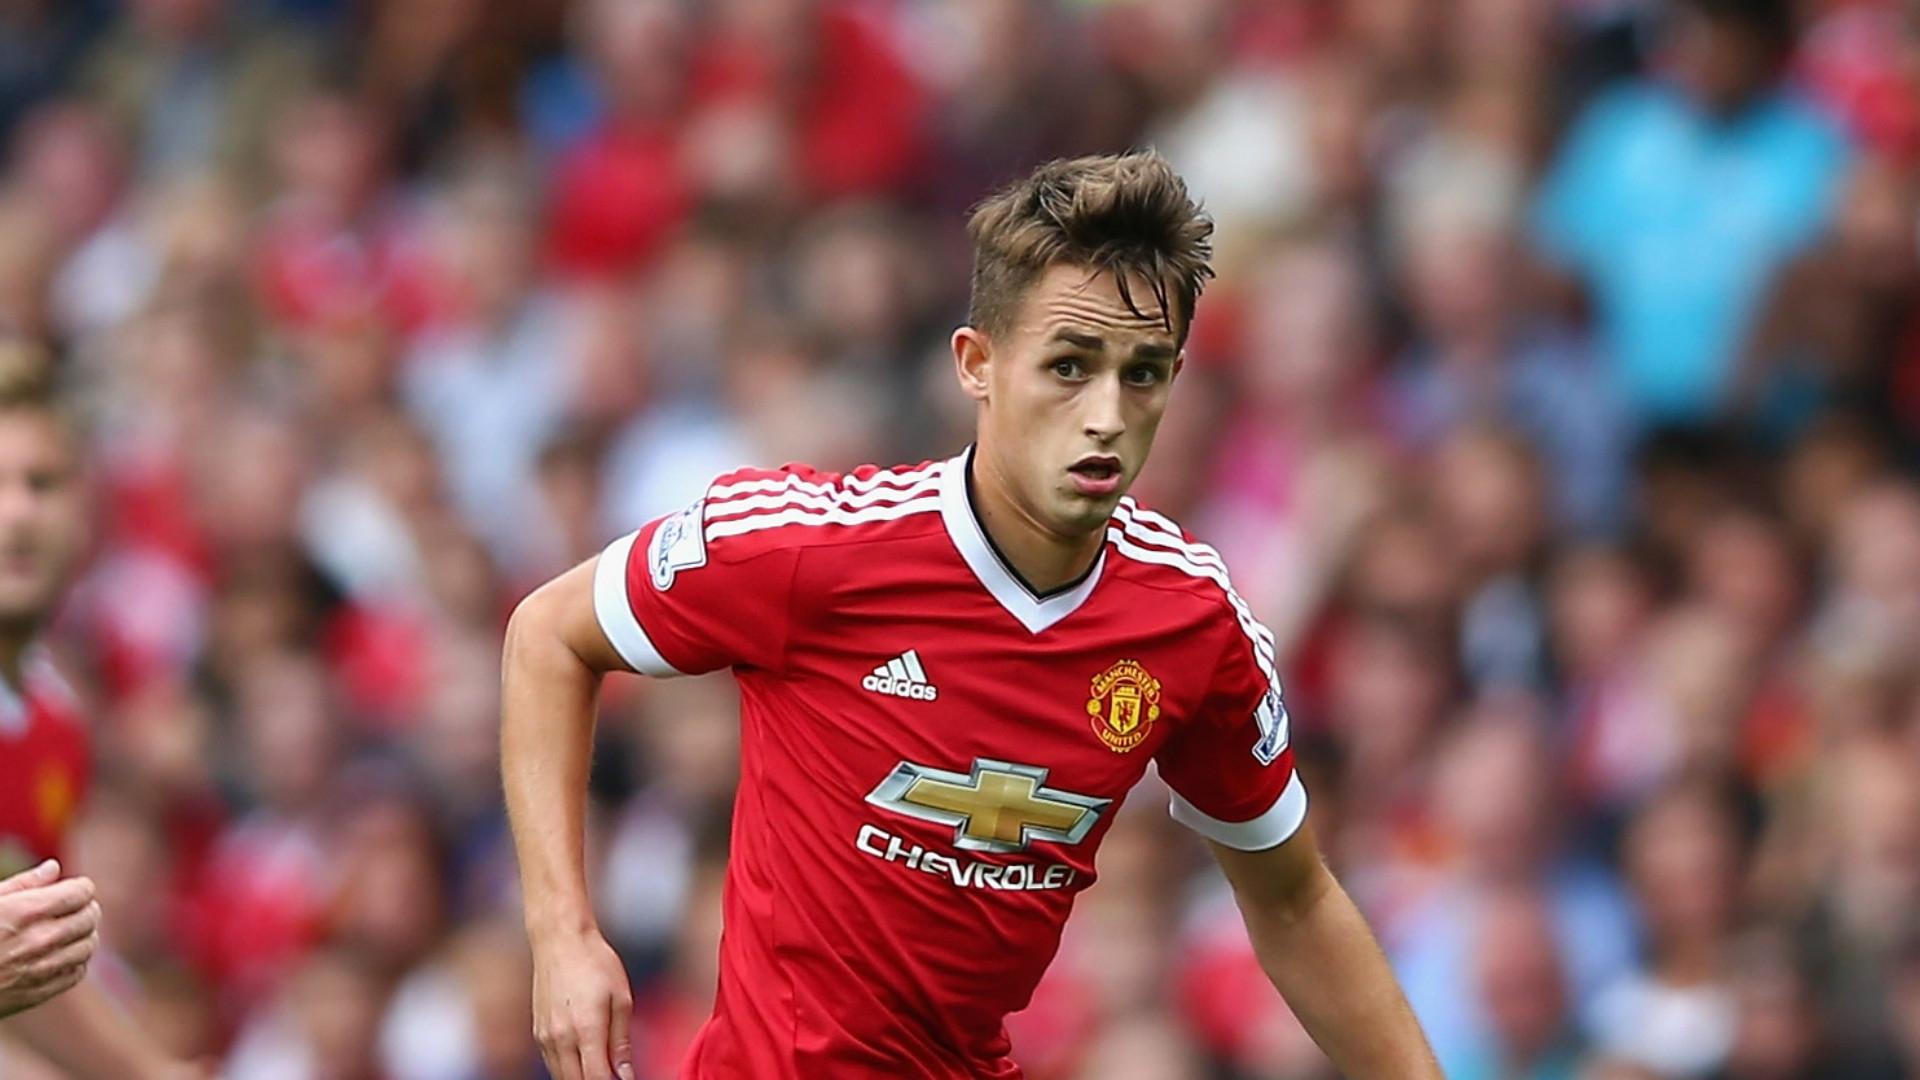 53 Daftar Pemain Muda Manchester United 2018